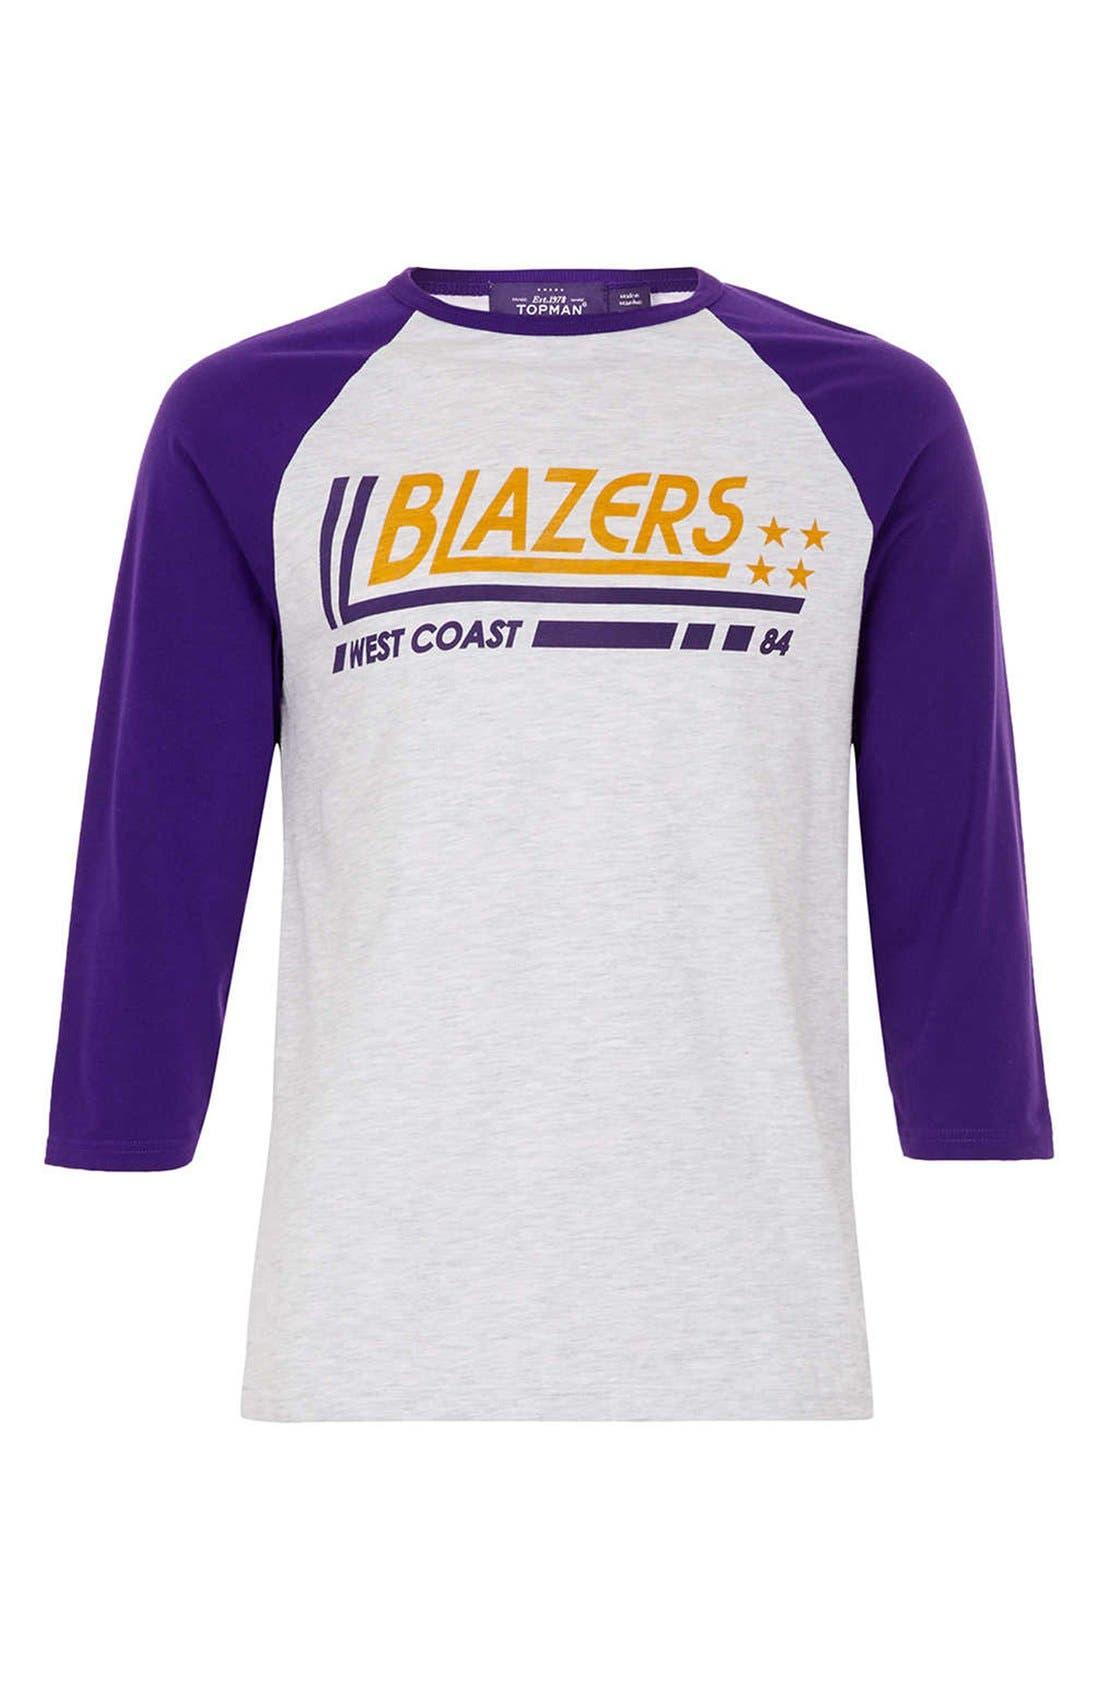 Main Image - Topman Blazers Baseball T-Shirt